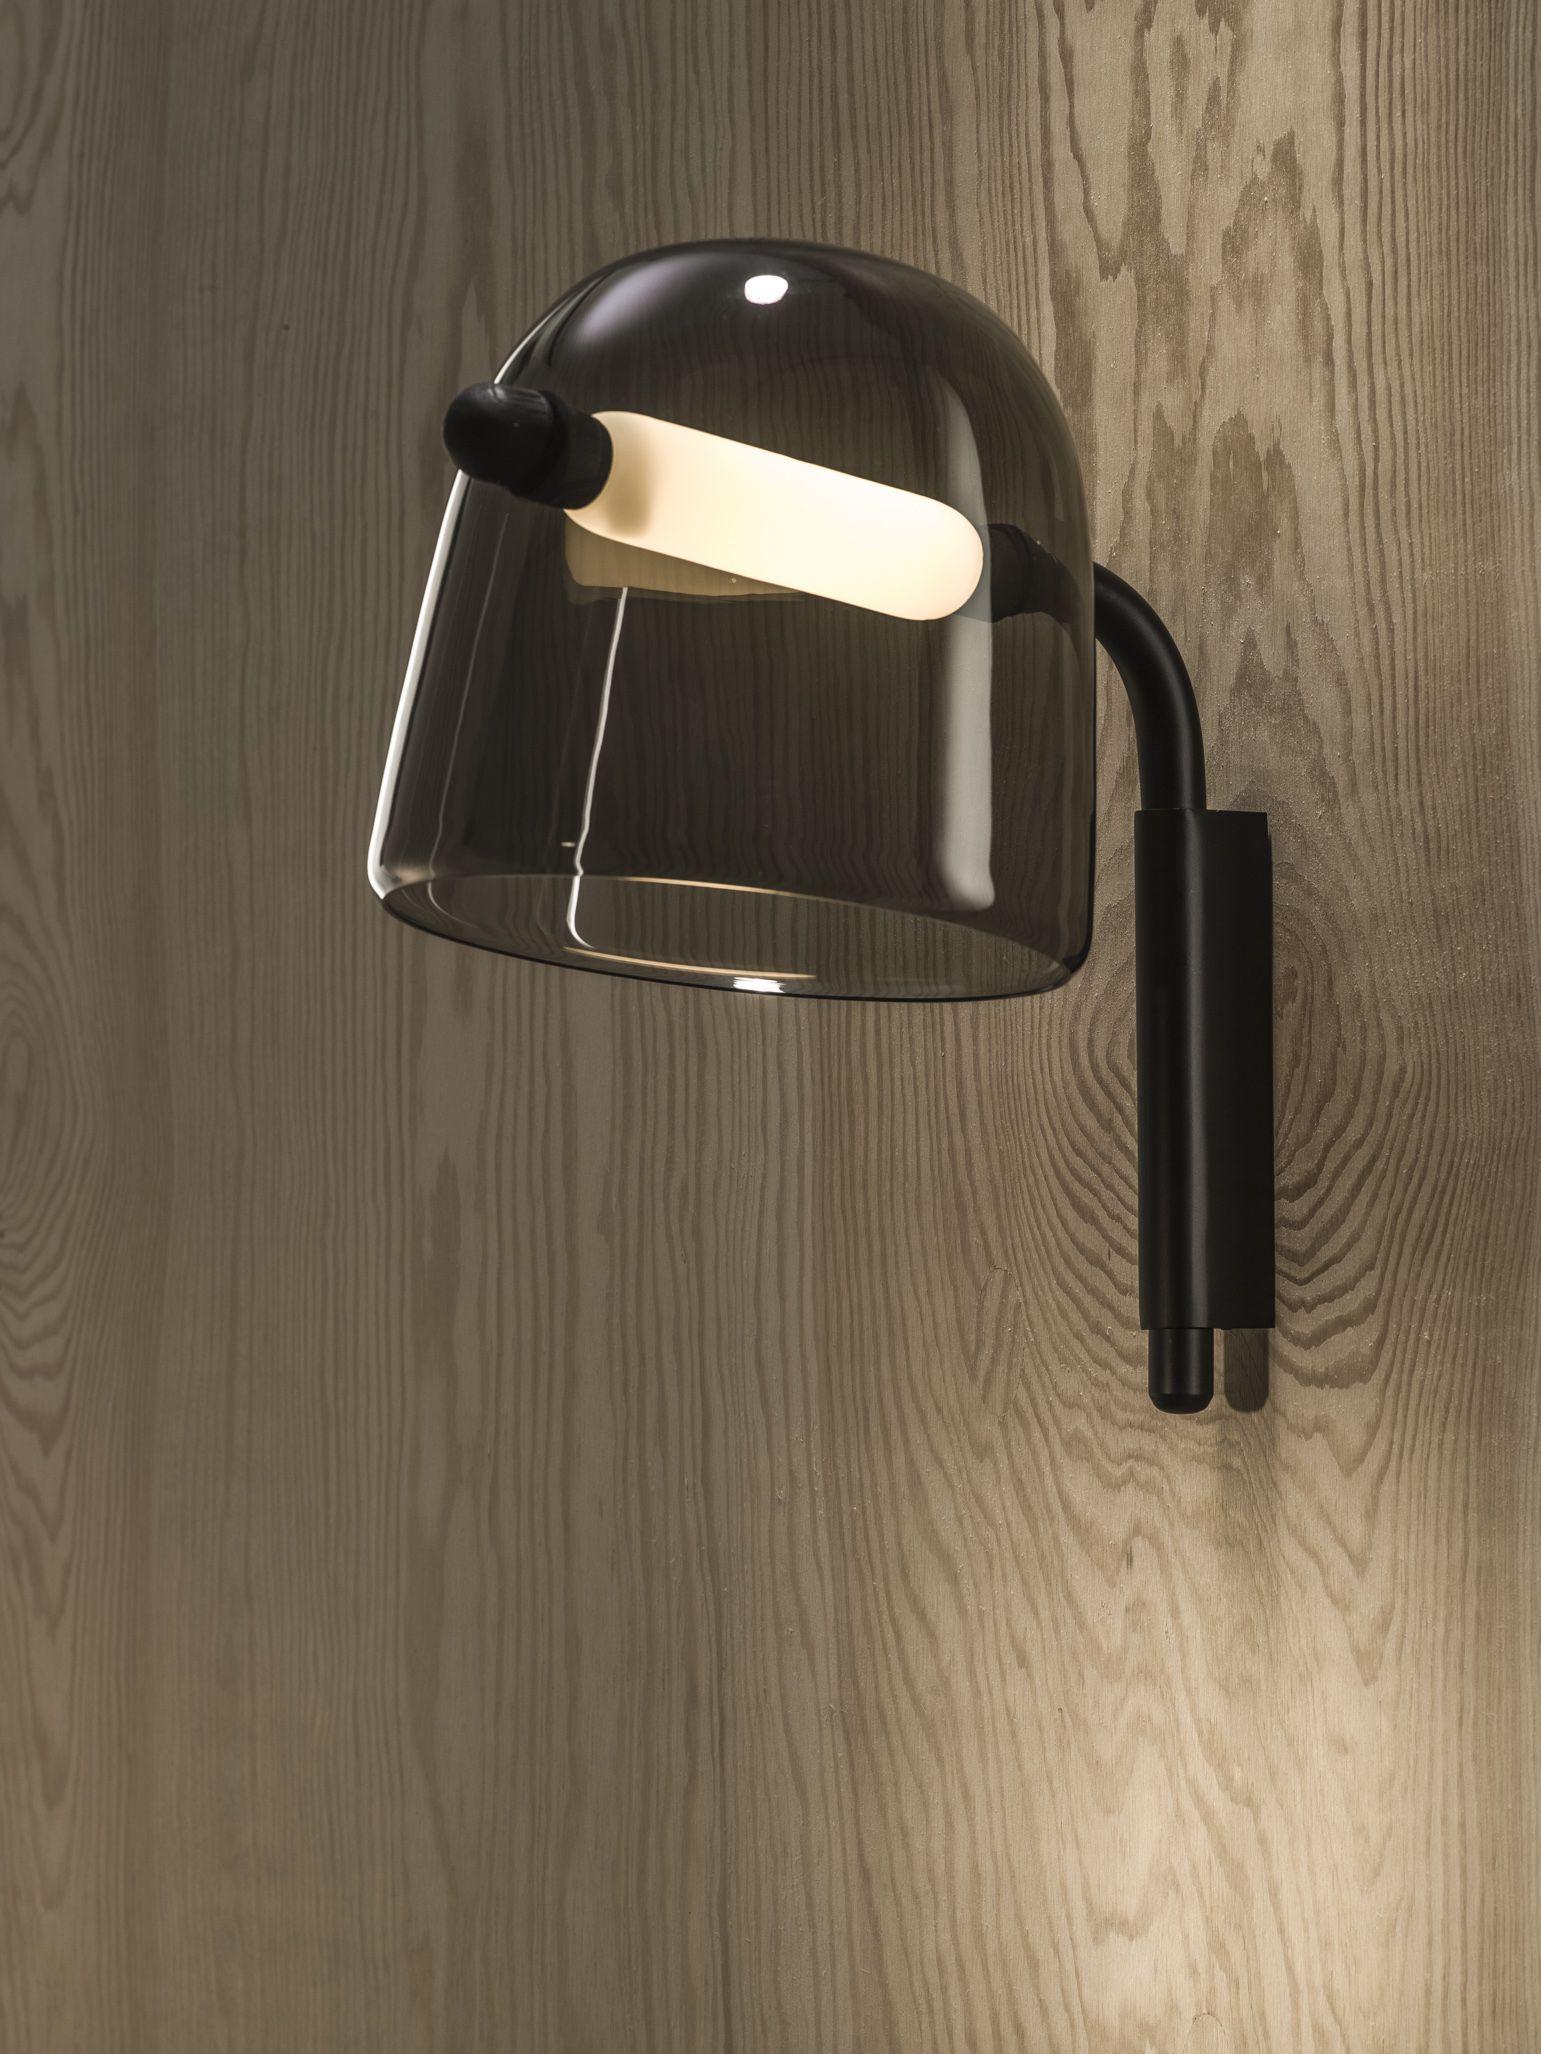 Wood interior brokis lights black mona design by lucie koldova